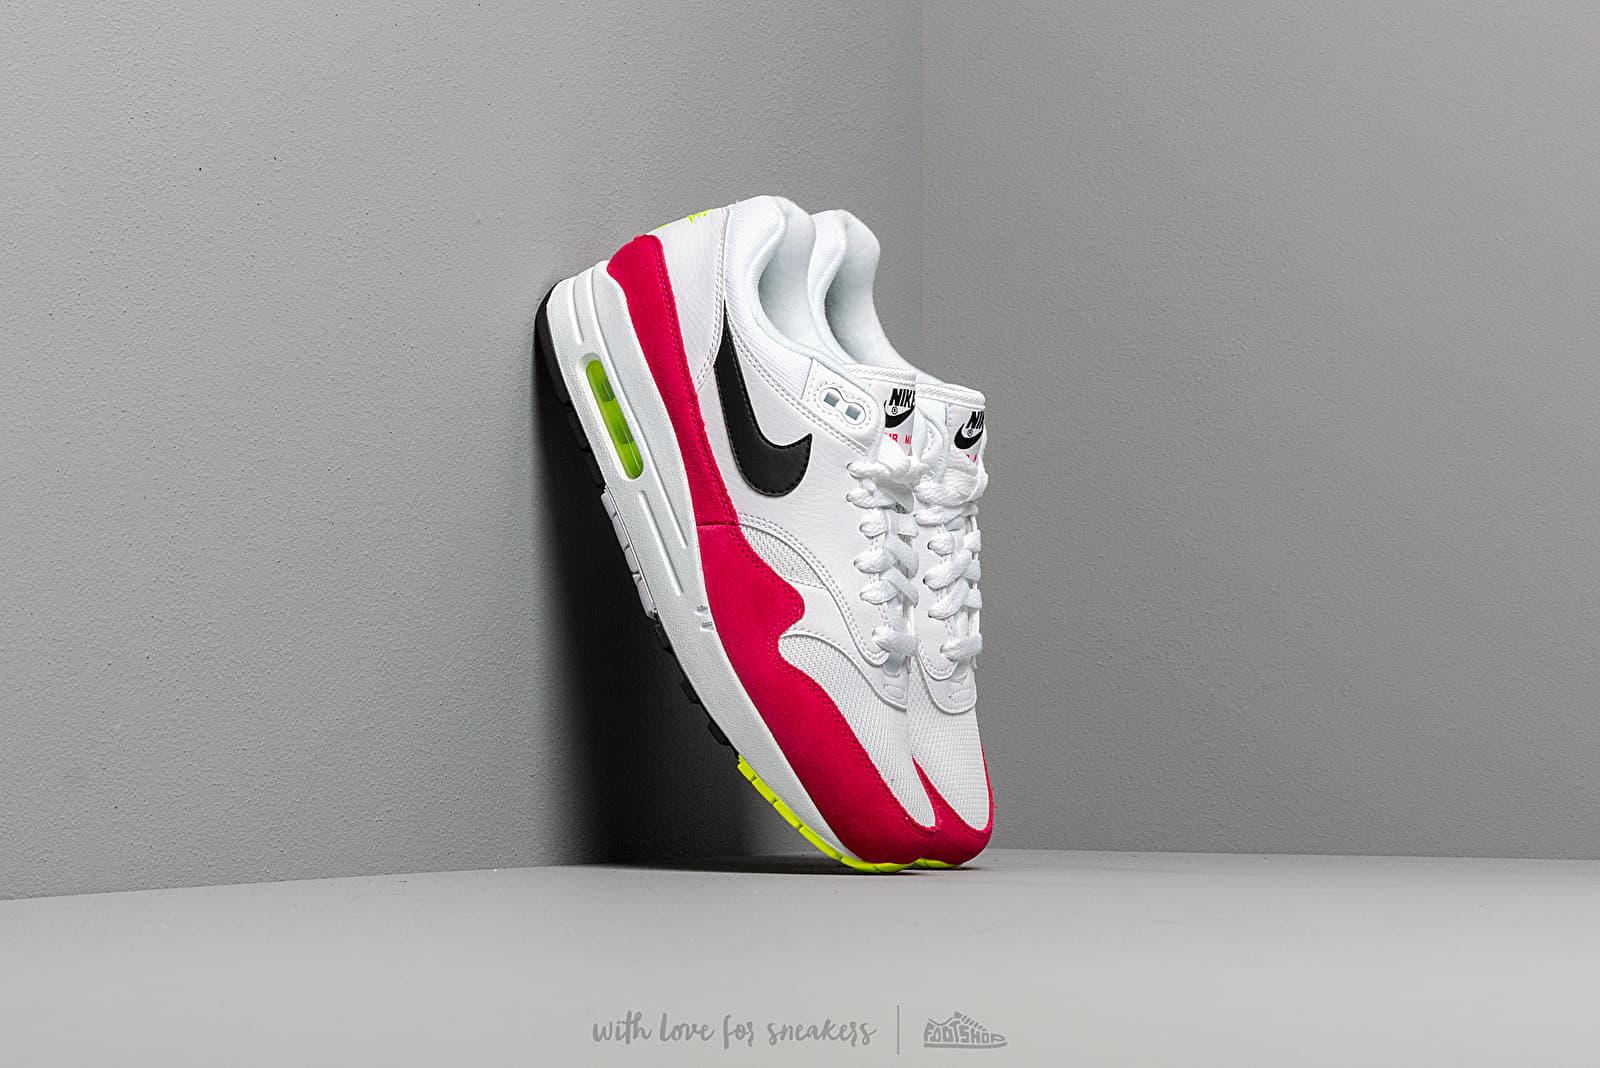 taille 40 1d59d 263a4 Nike Air Max 1 White/ Black-Volt-Rush Pink | Footshop